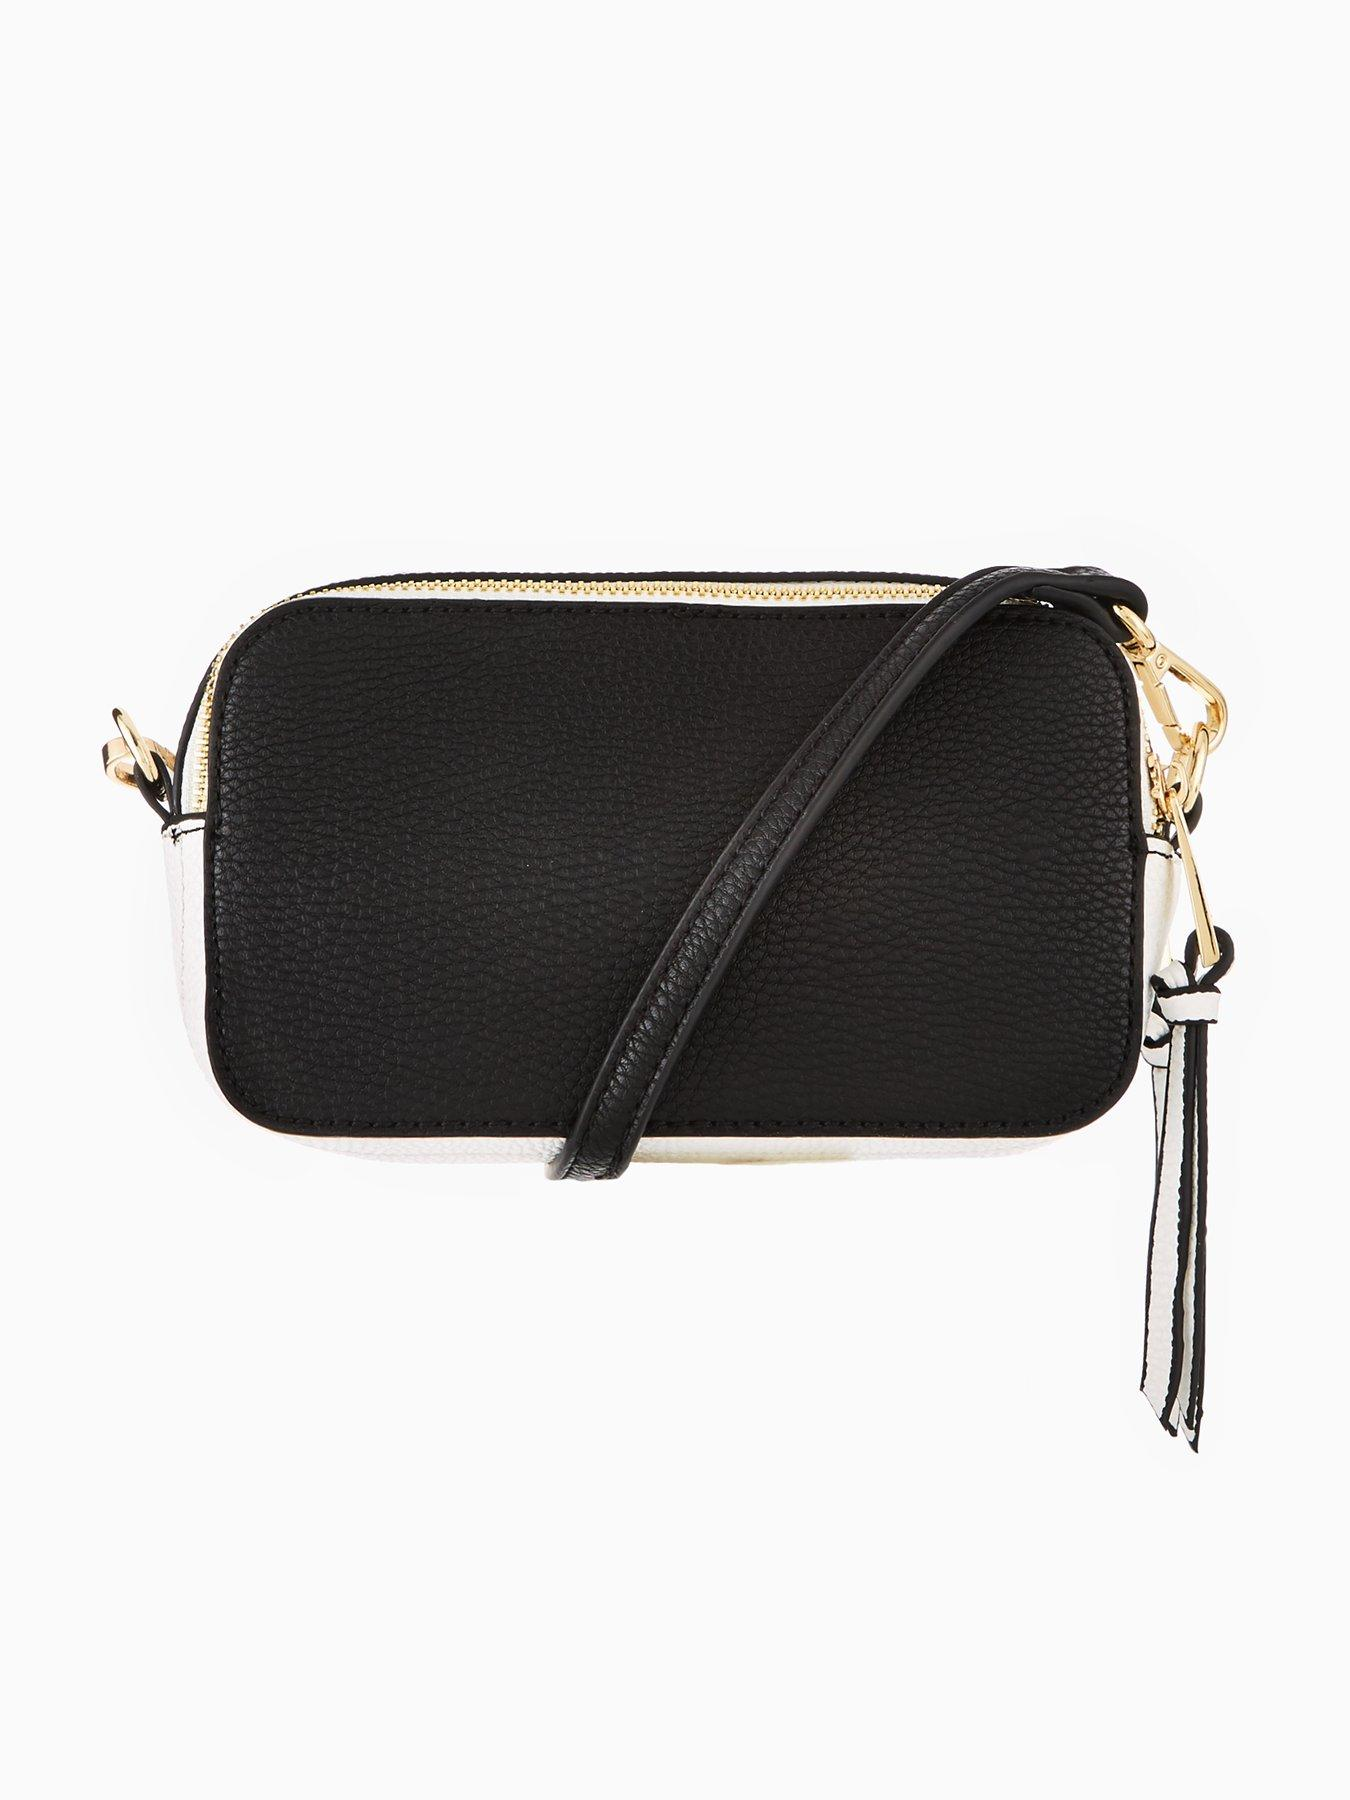 V by Very Double Zip Crossbody Bag - Monochrome